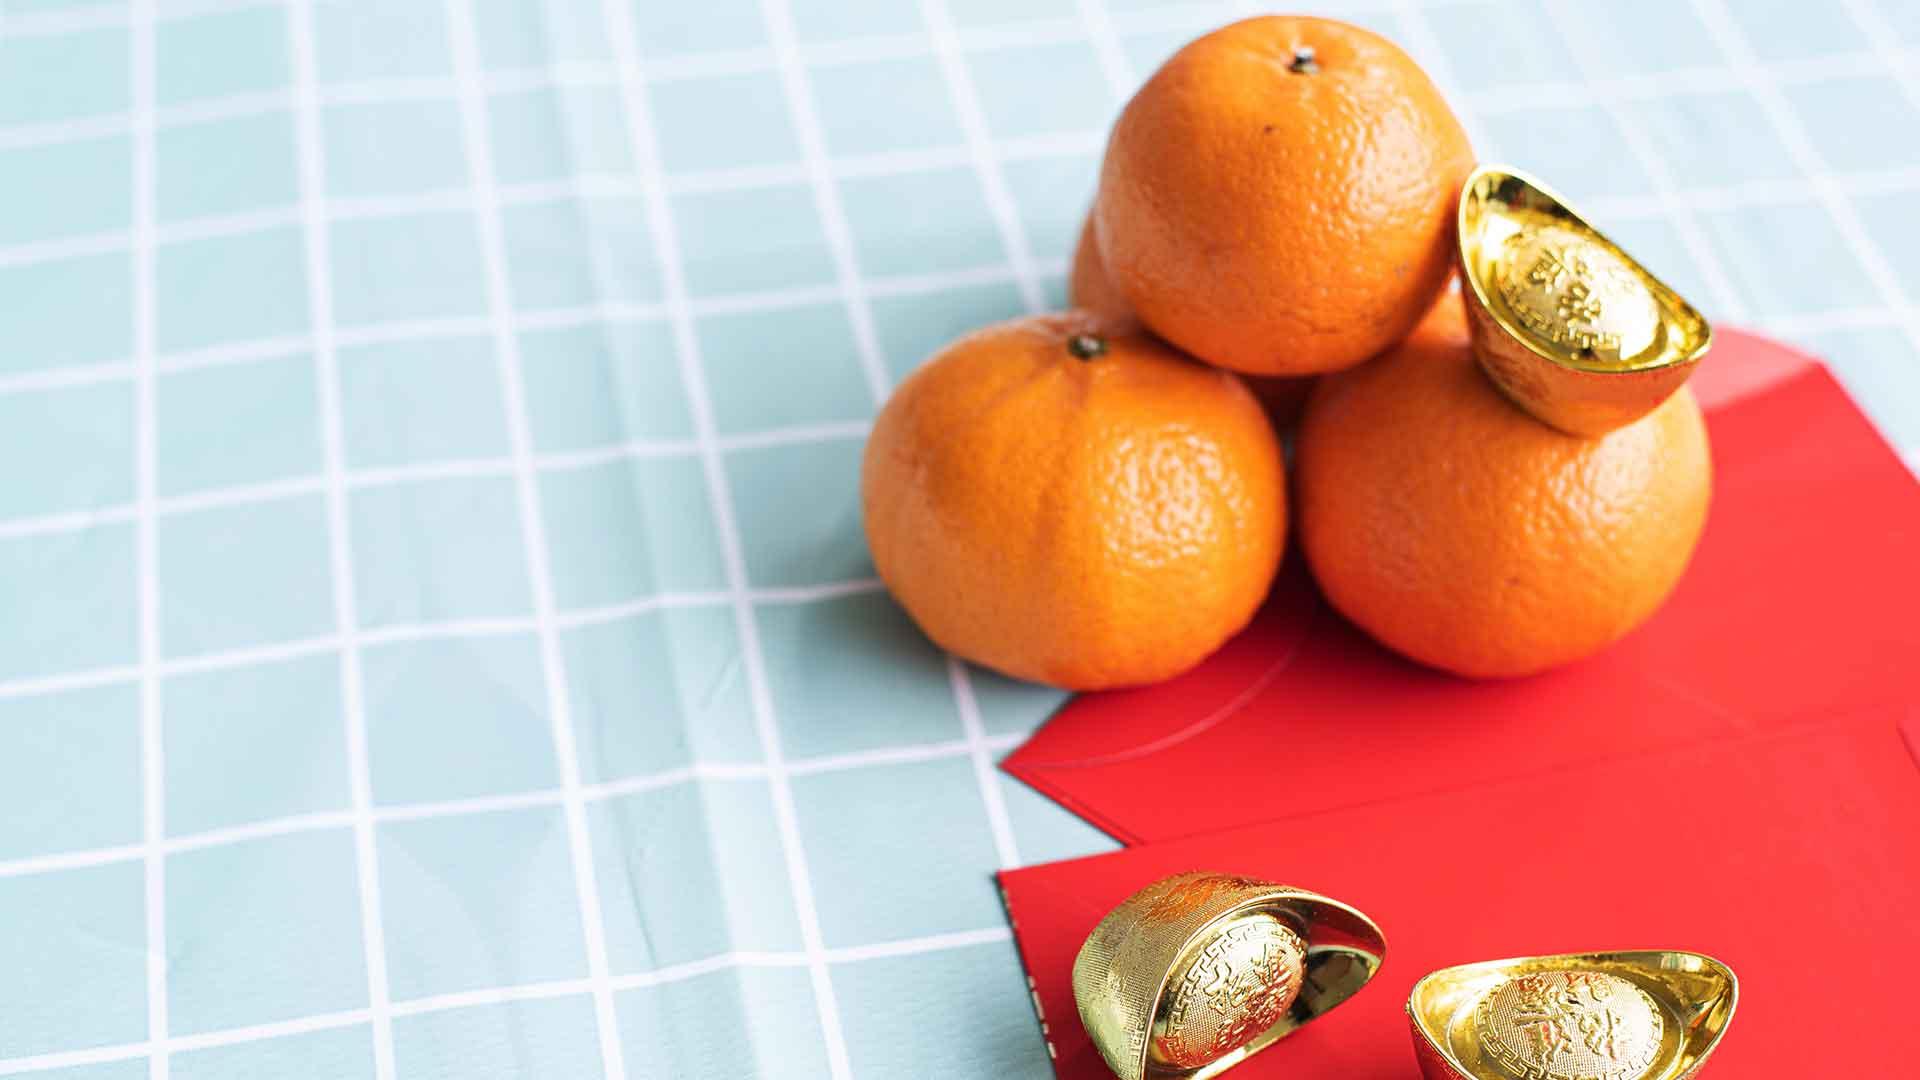 CNY 2019 mandarin oranges giveaway